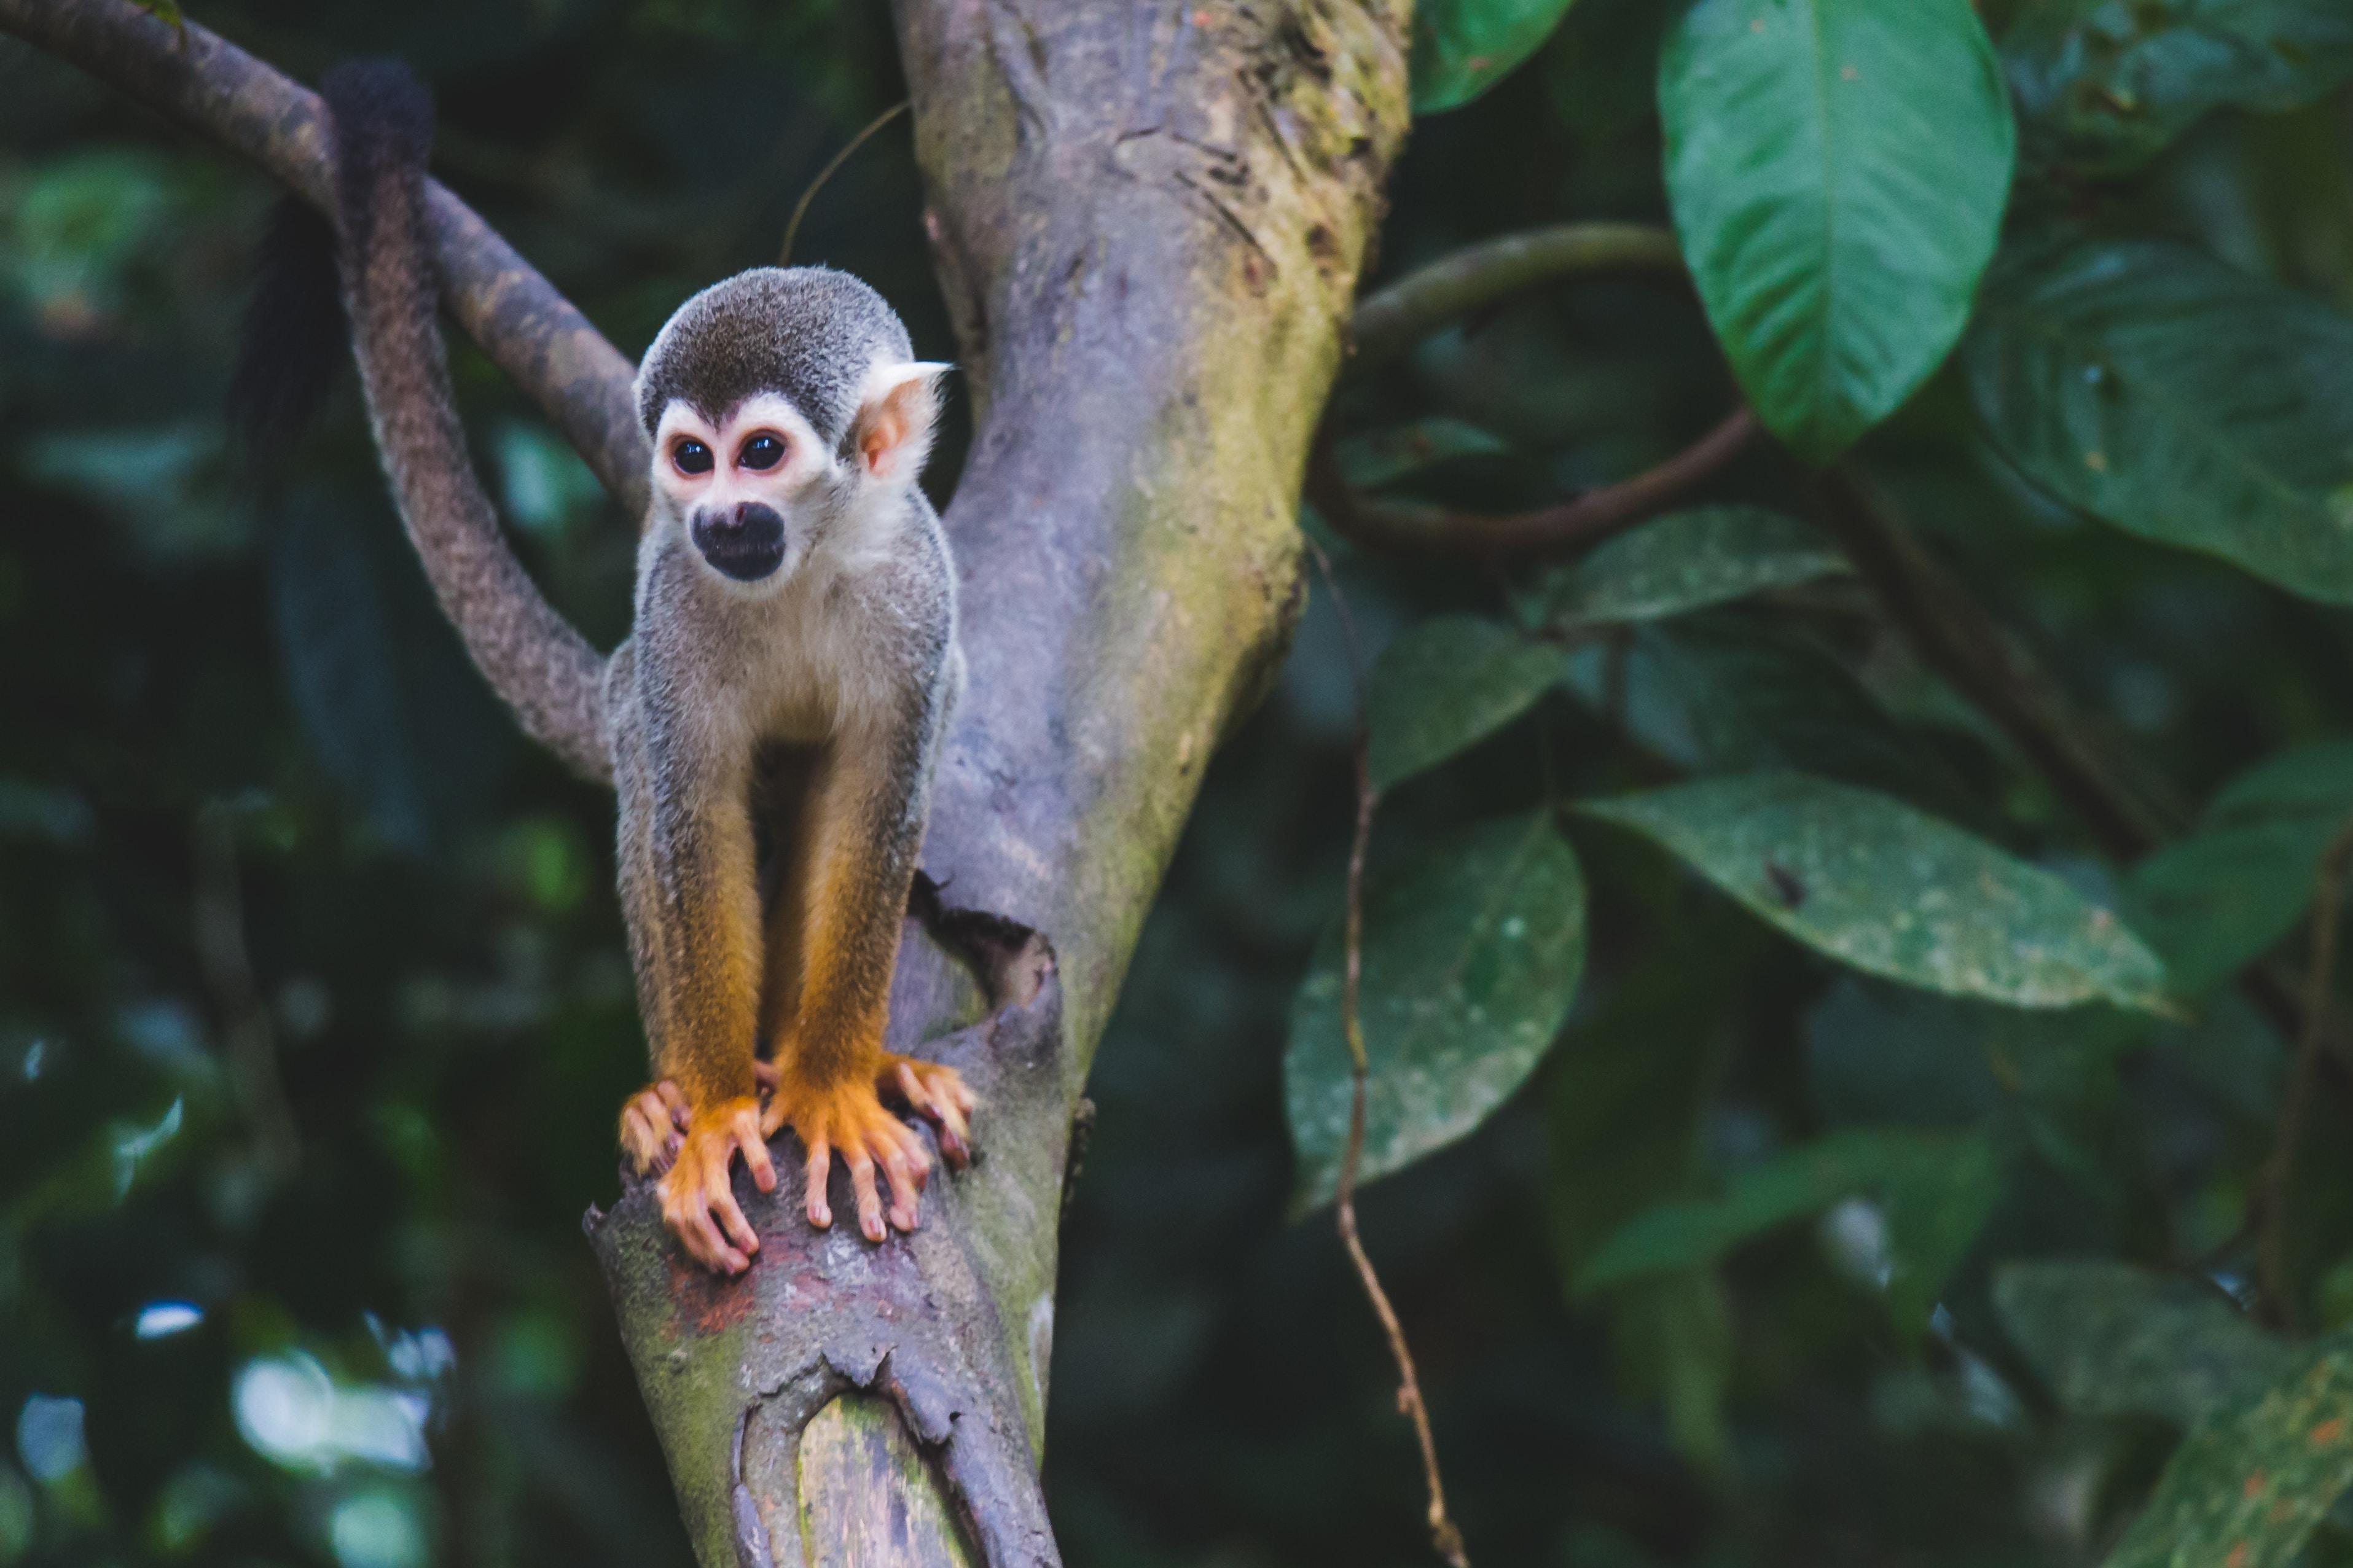 brown monkey in tree